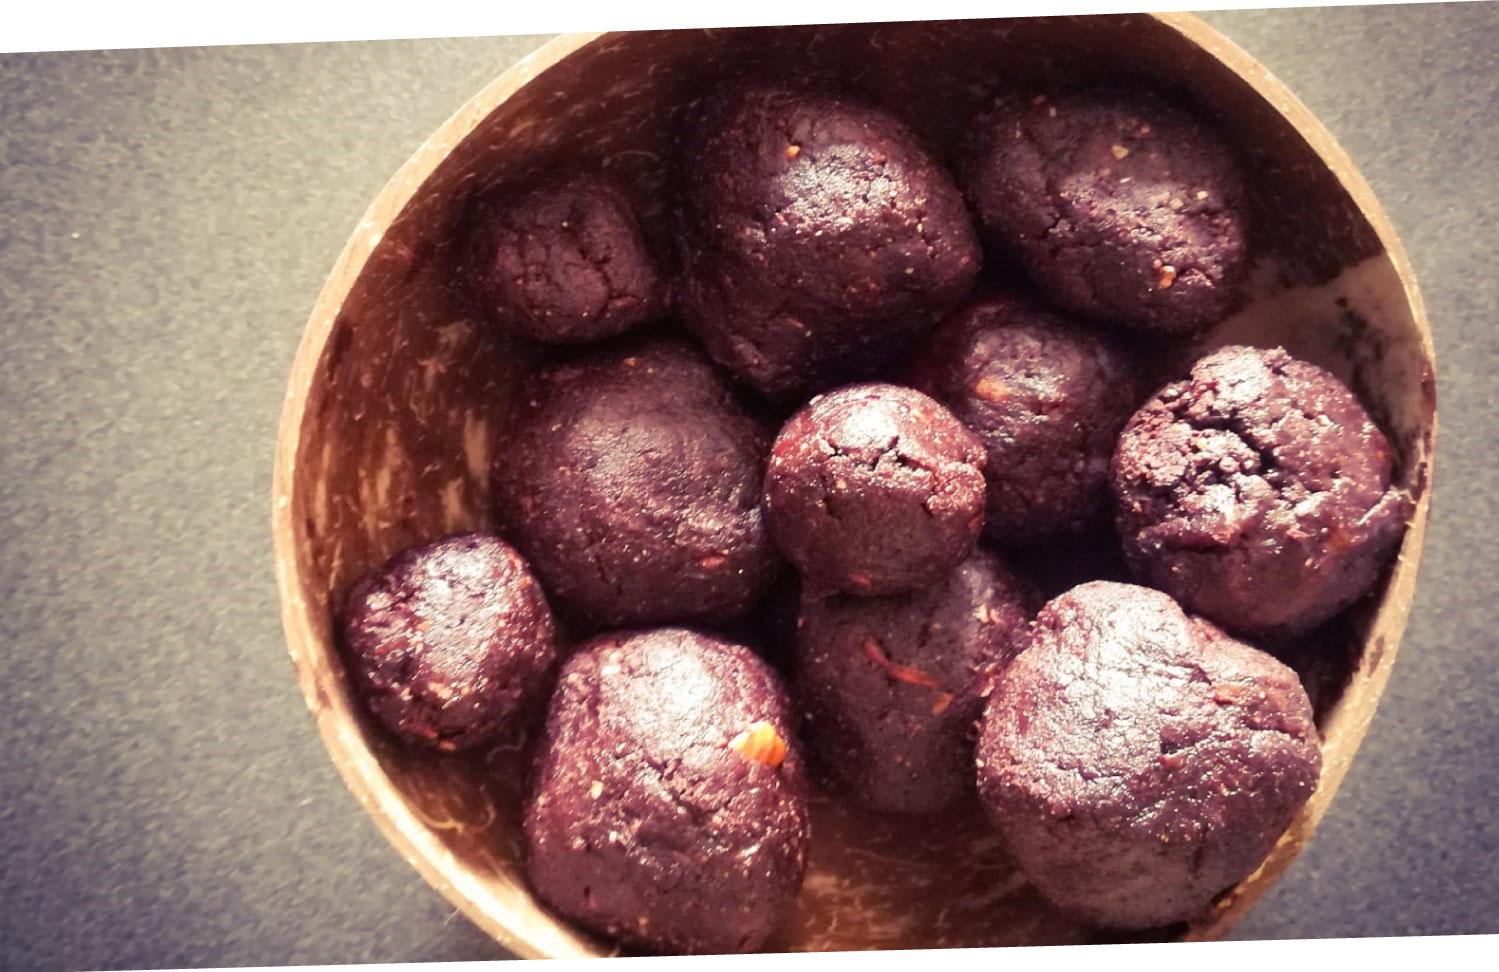 ramona-debono-Chocolate-Lover-Smoothie-Bowl-balls-ready-2